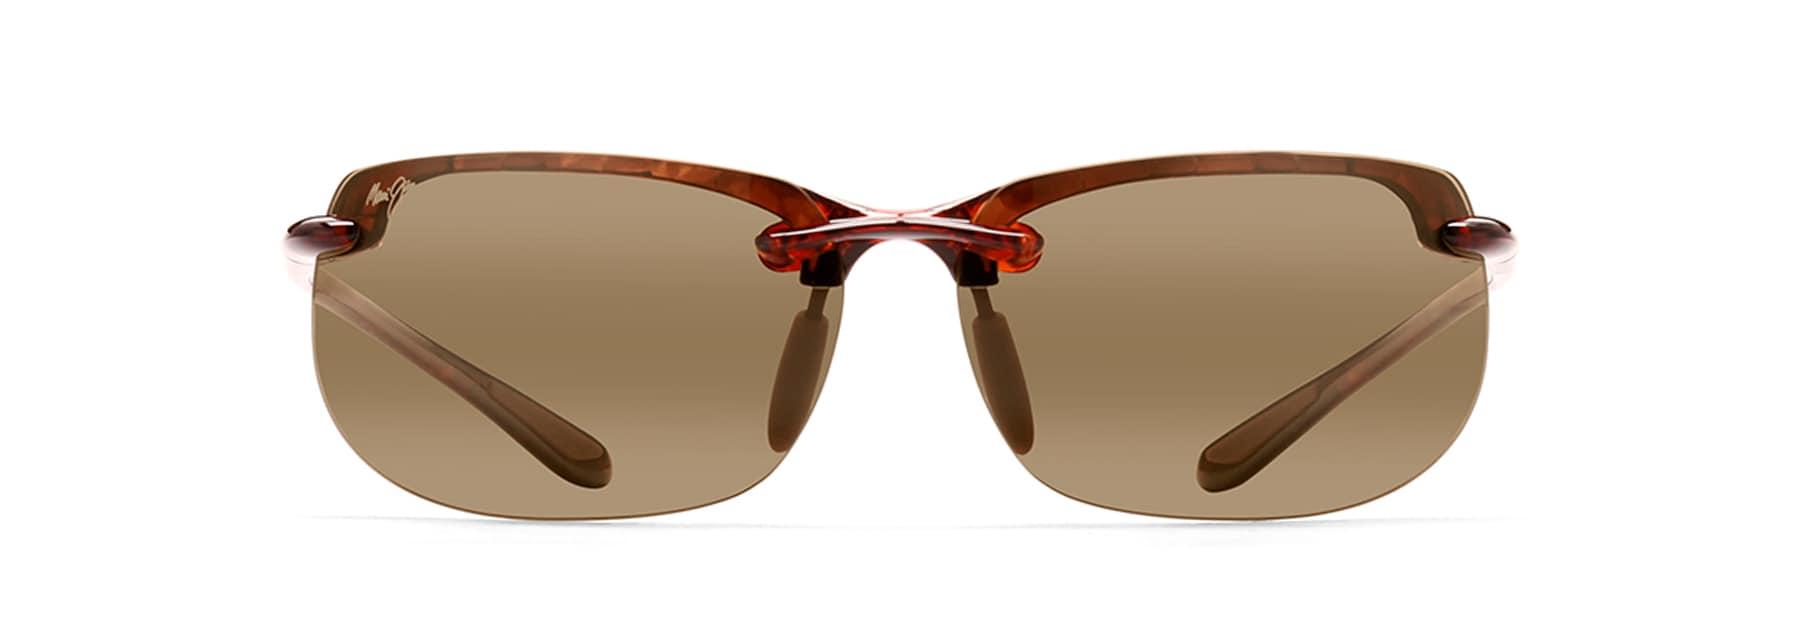 66770996782 Banyans Polarised Sunglasses